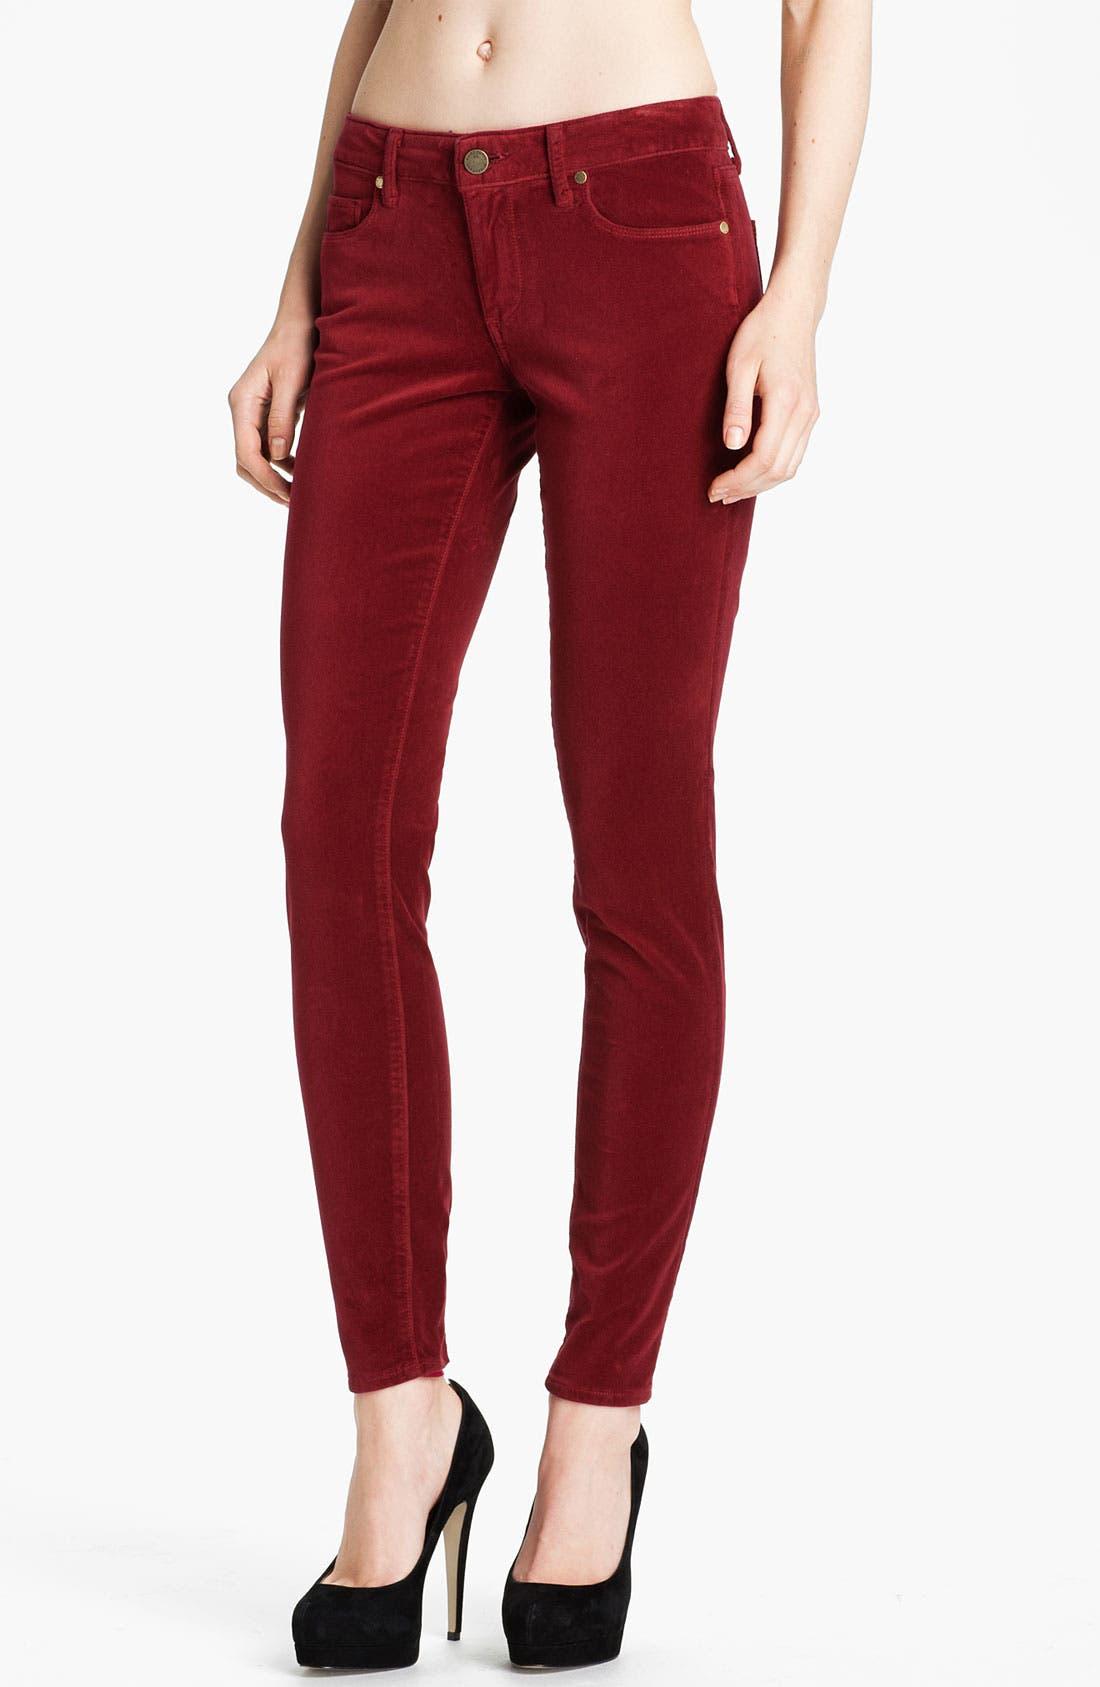 Alternate Image 1 Selected - Paige Denim 'Verdugo' Stretch Velvet Skinny Pants (Lava)